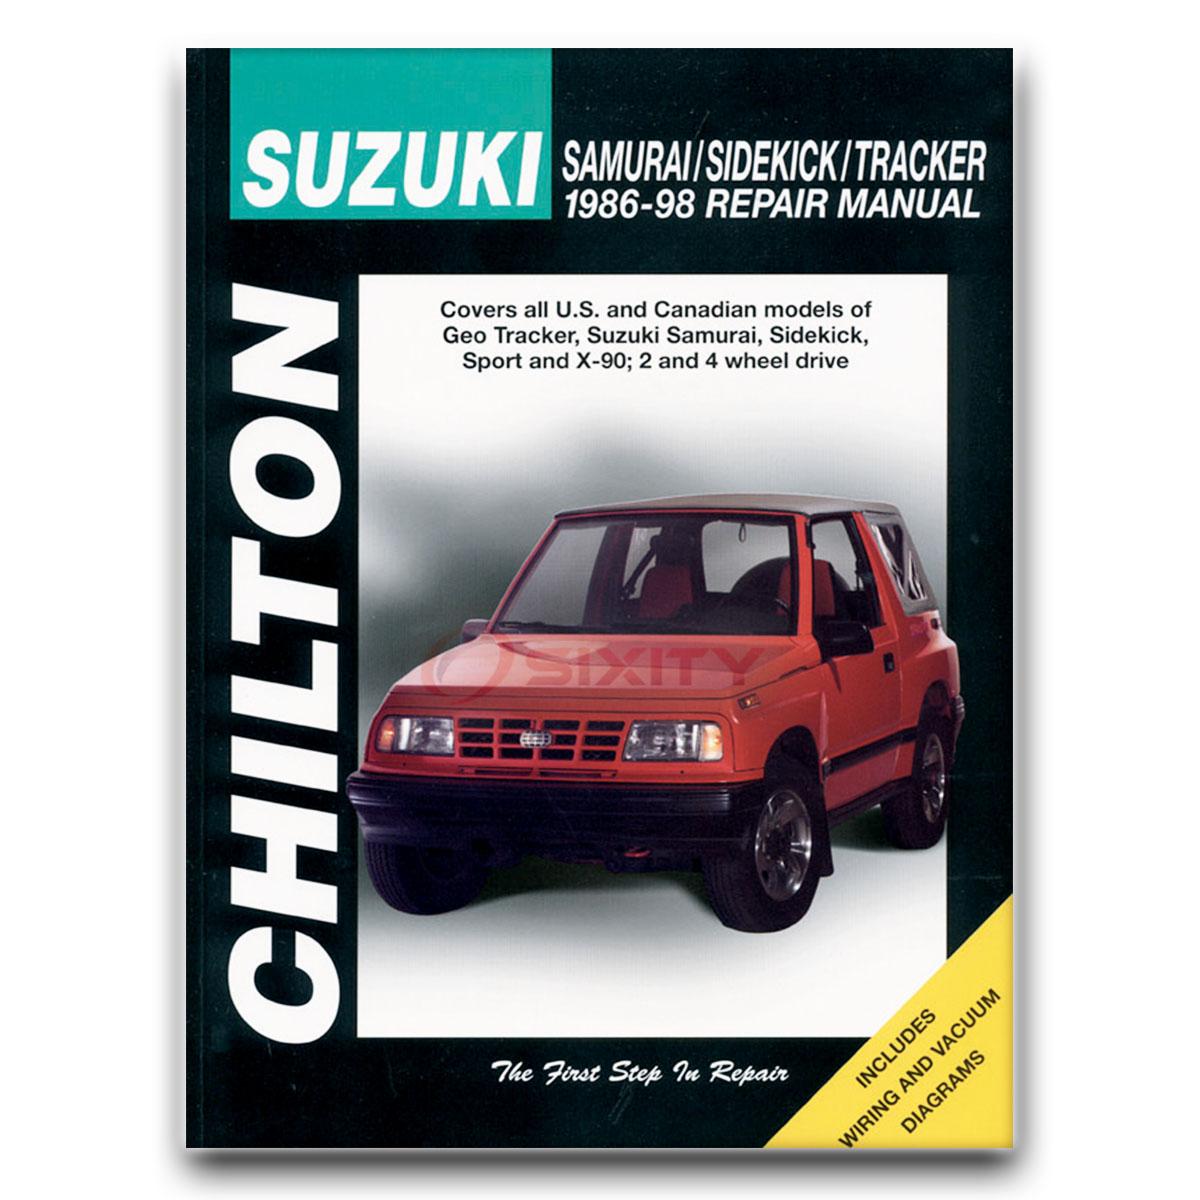 Chilton Repair Manual for Suzuki Samurai JX SE JS JL Base JA Shop Service rr